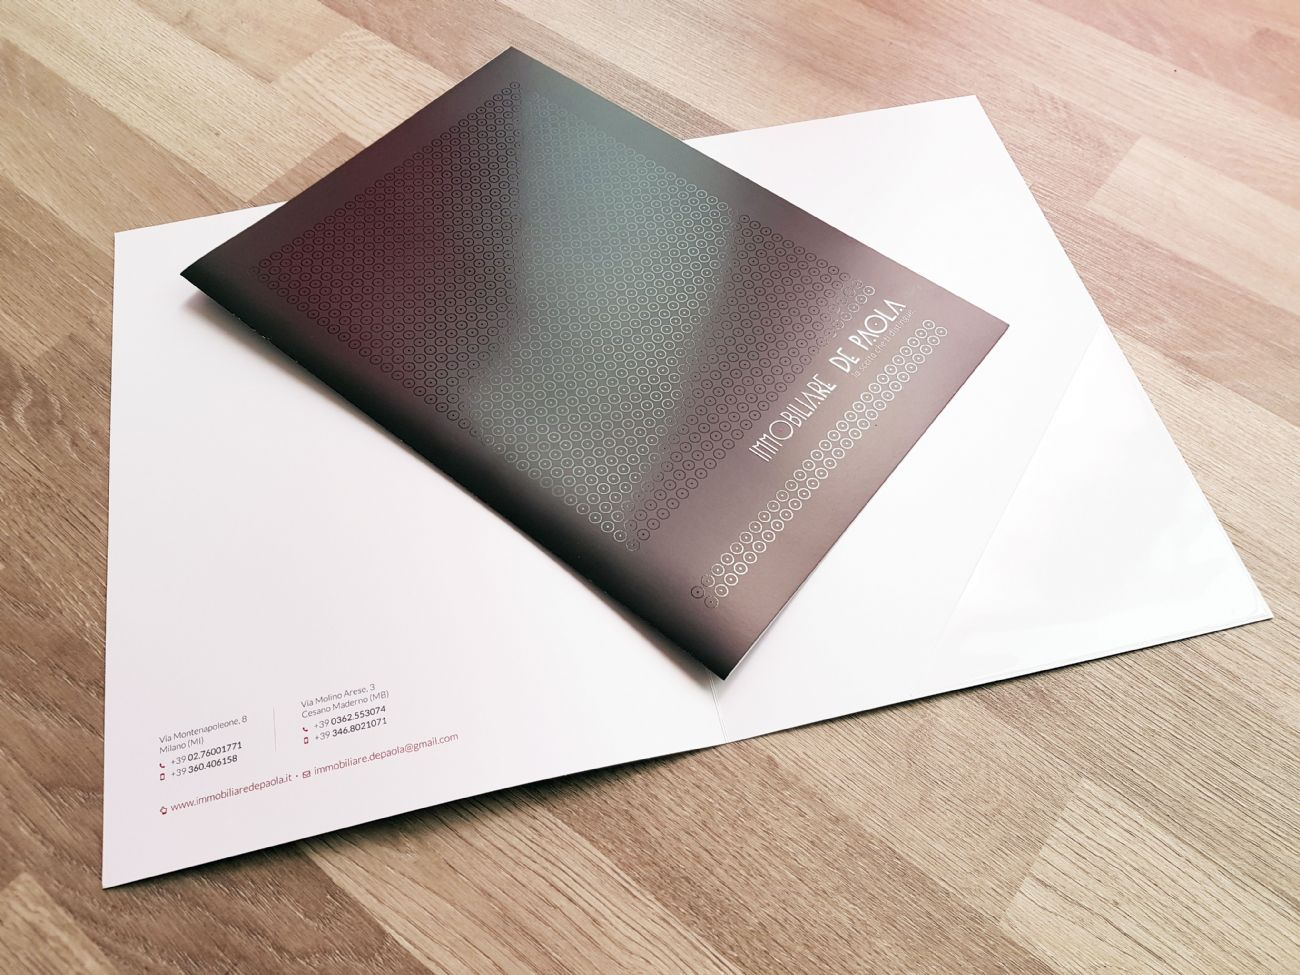 Elegante cartelletta porta documenti